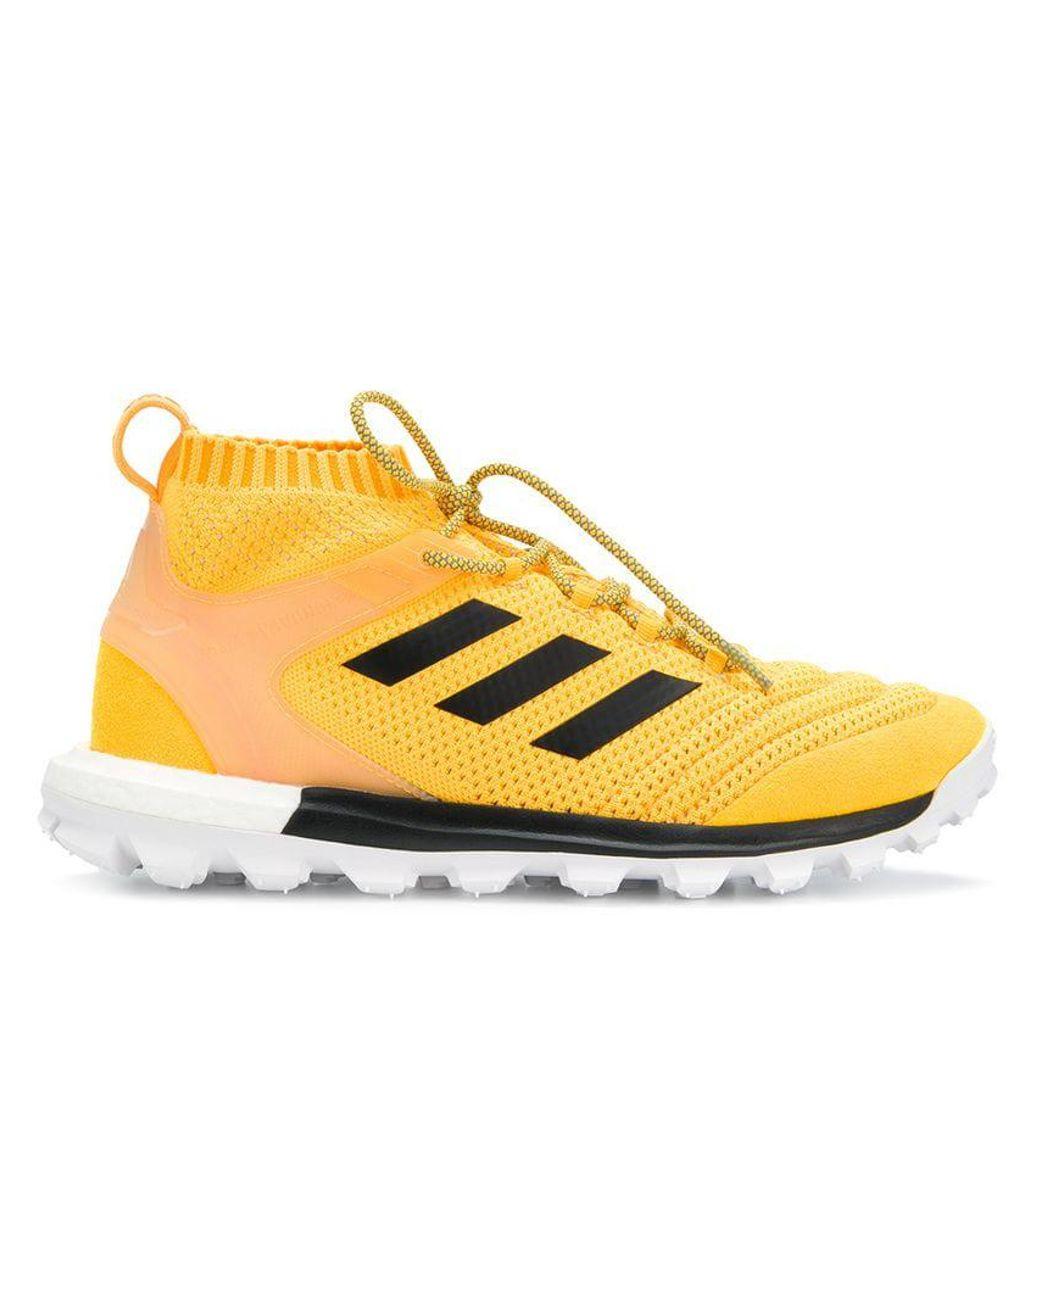 155a03ce7d3 Gosha Rubchinskiy X Adidas Copa Primeknit Sneakers in Yellow - Save 8% -  Lyst